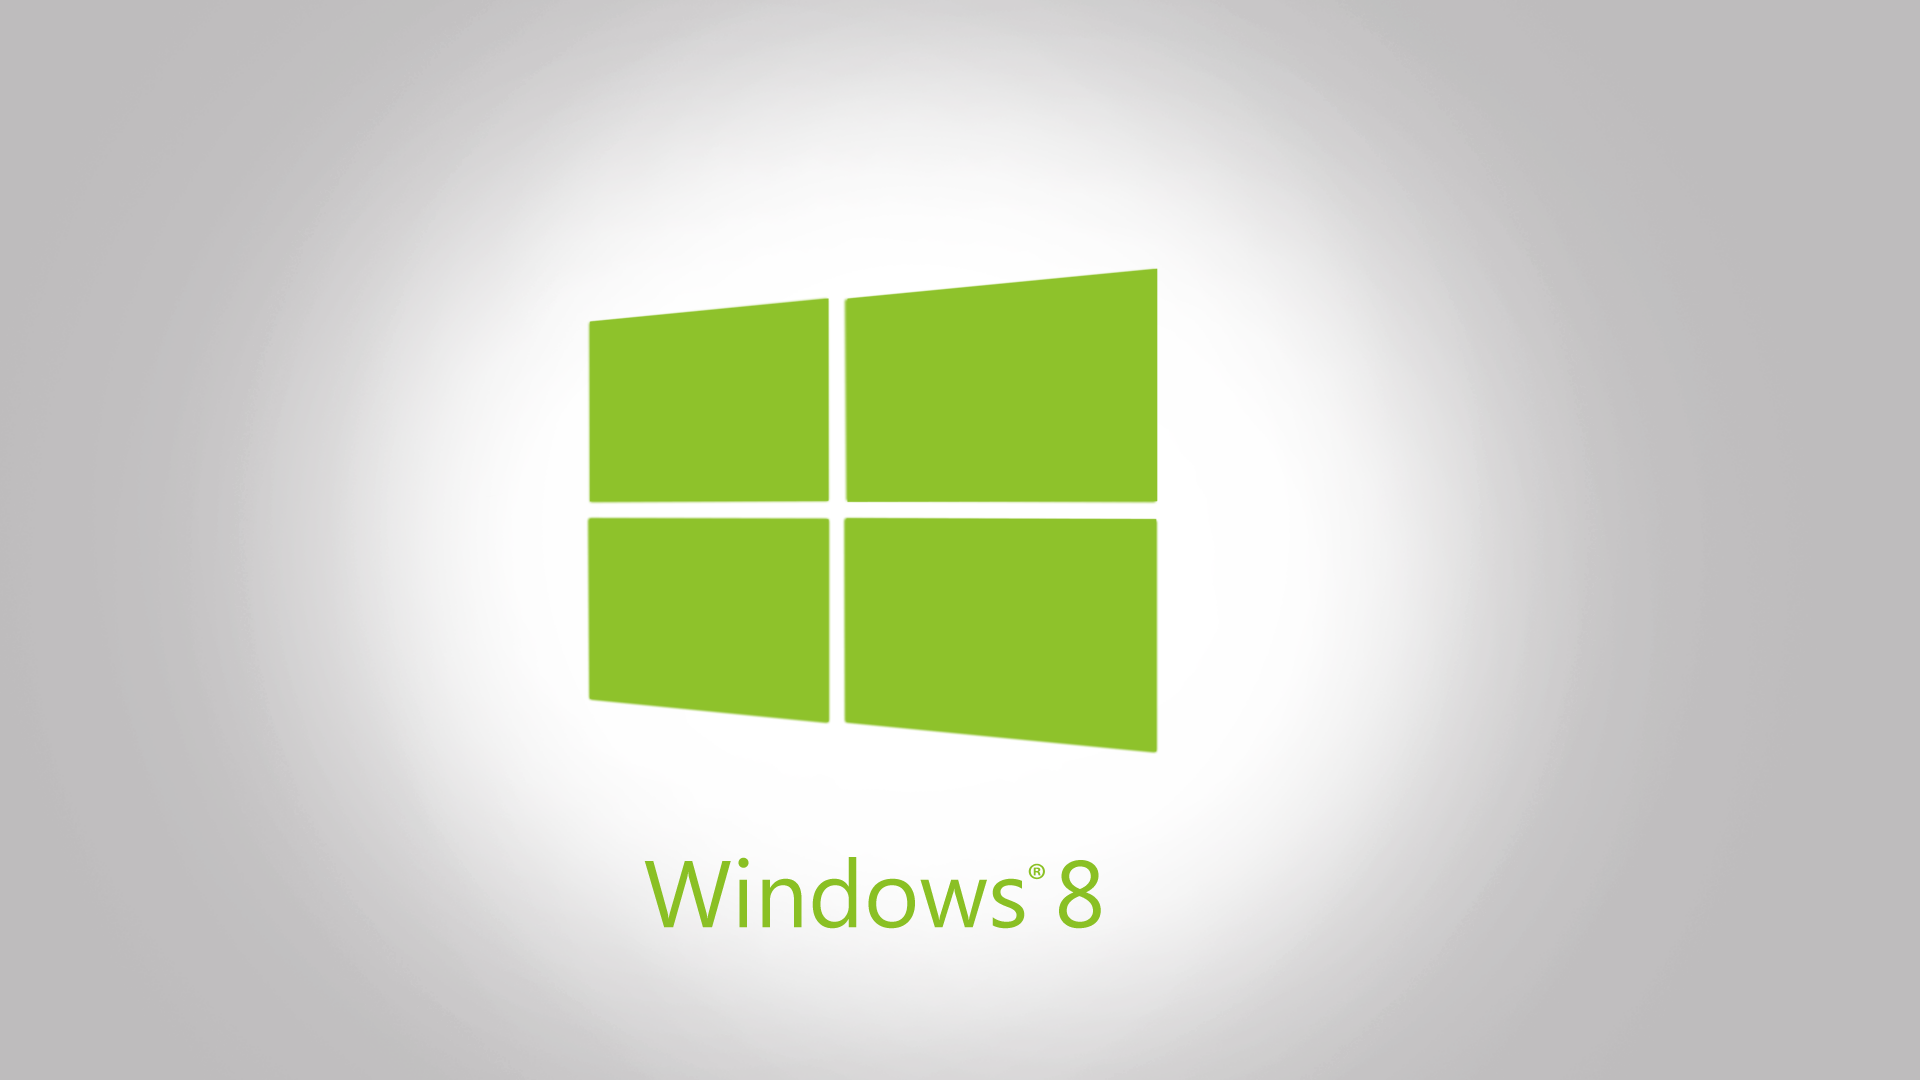 Windows 8 Green Logo